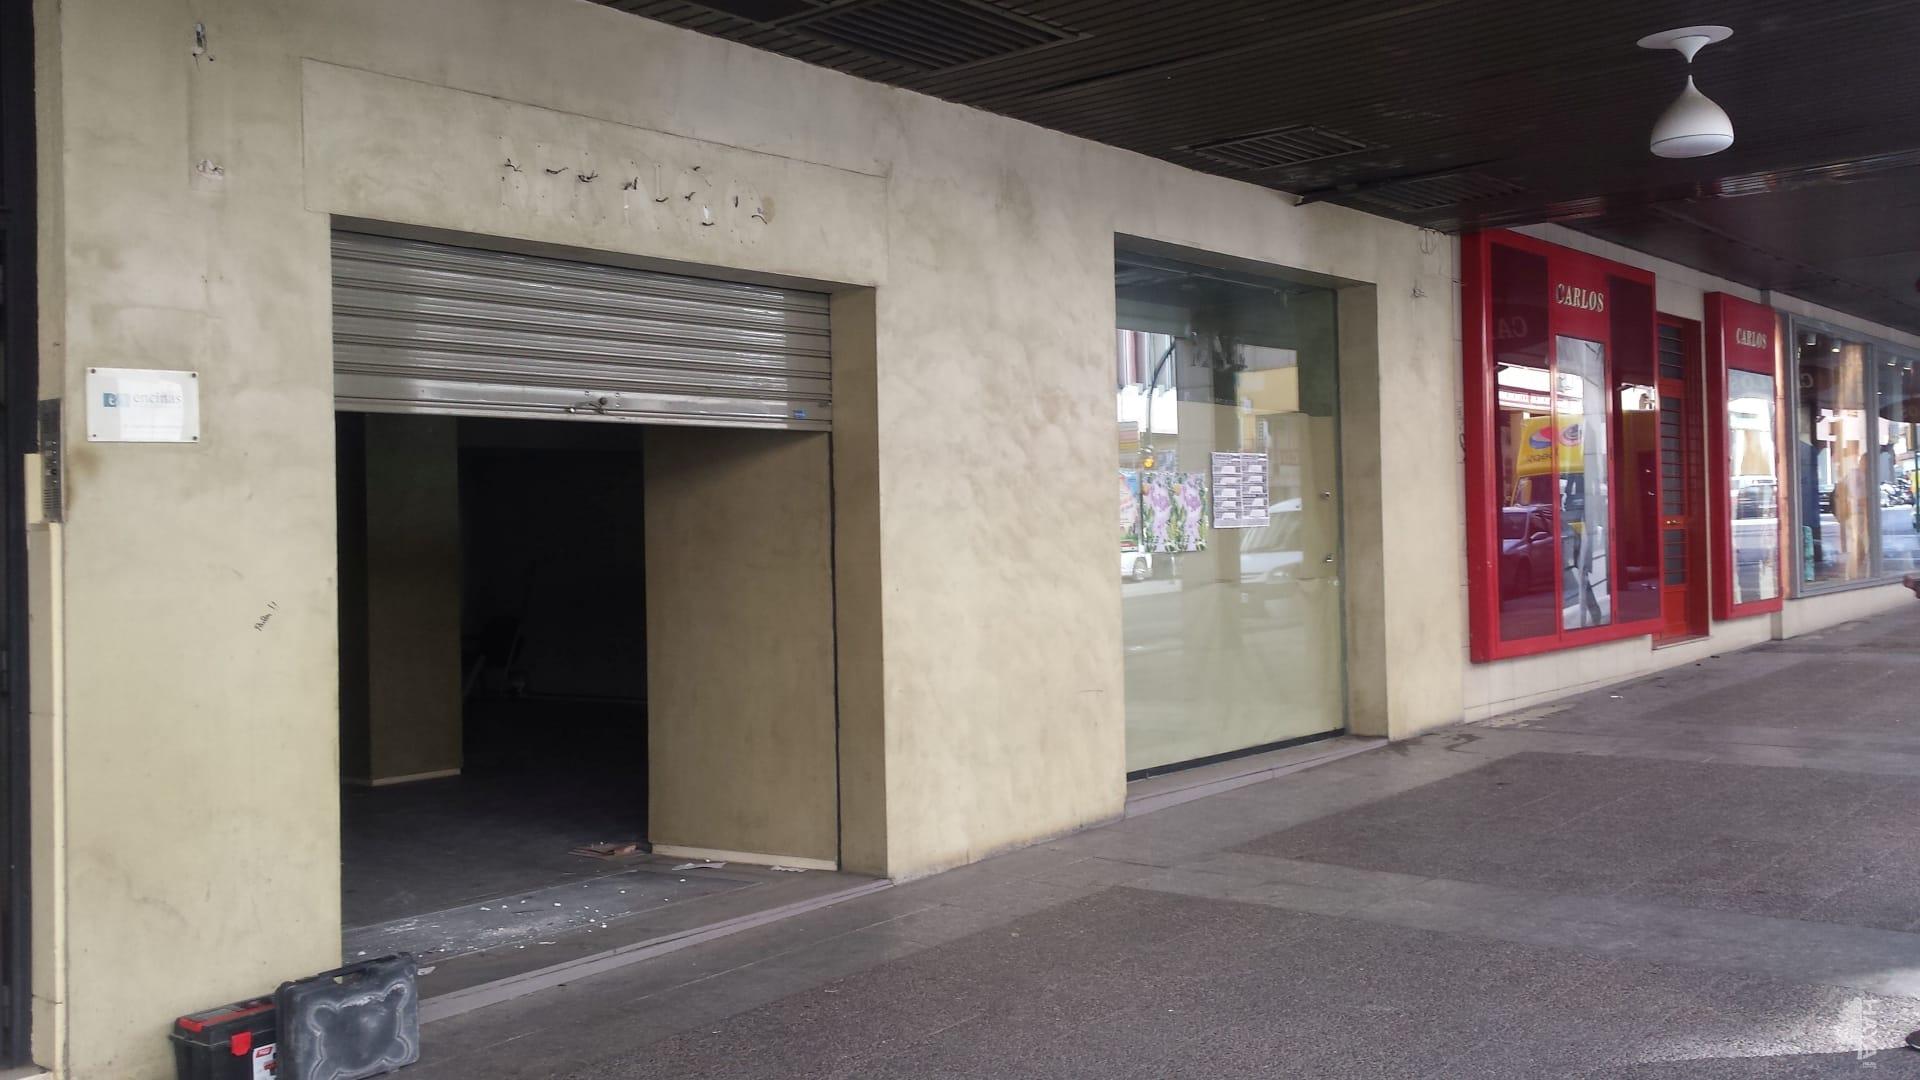 Local en venta en Badajoz, Badajoz, Calle Juan Carlos I, 1.070.600 €, 308 m2